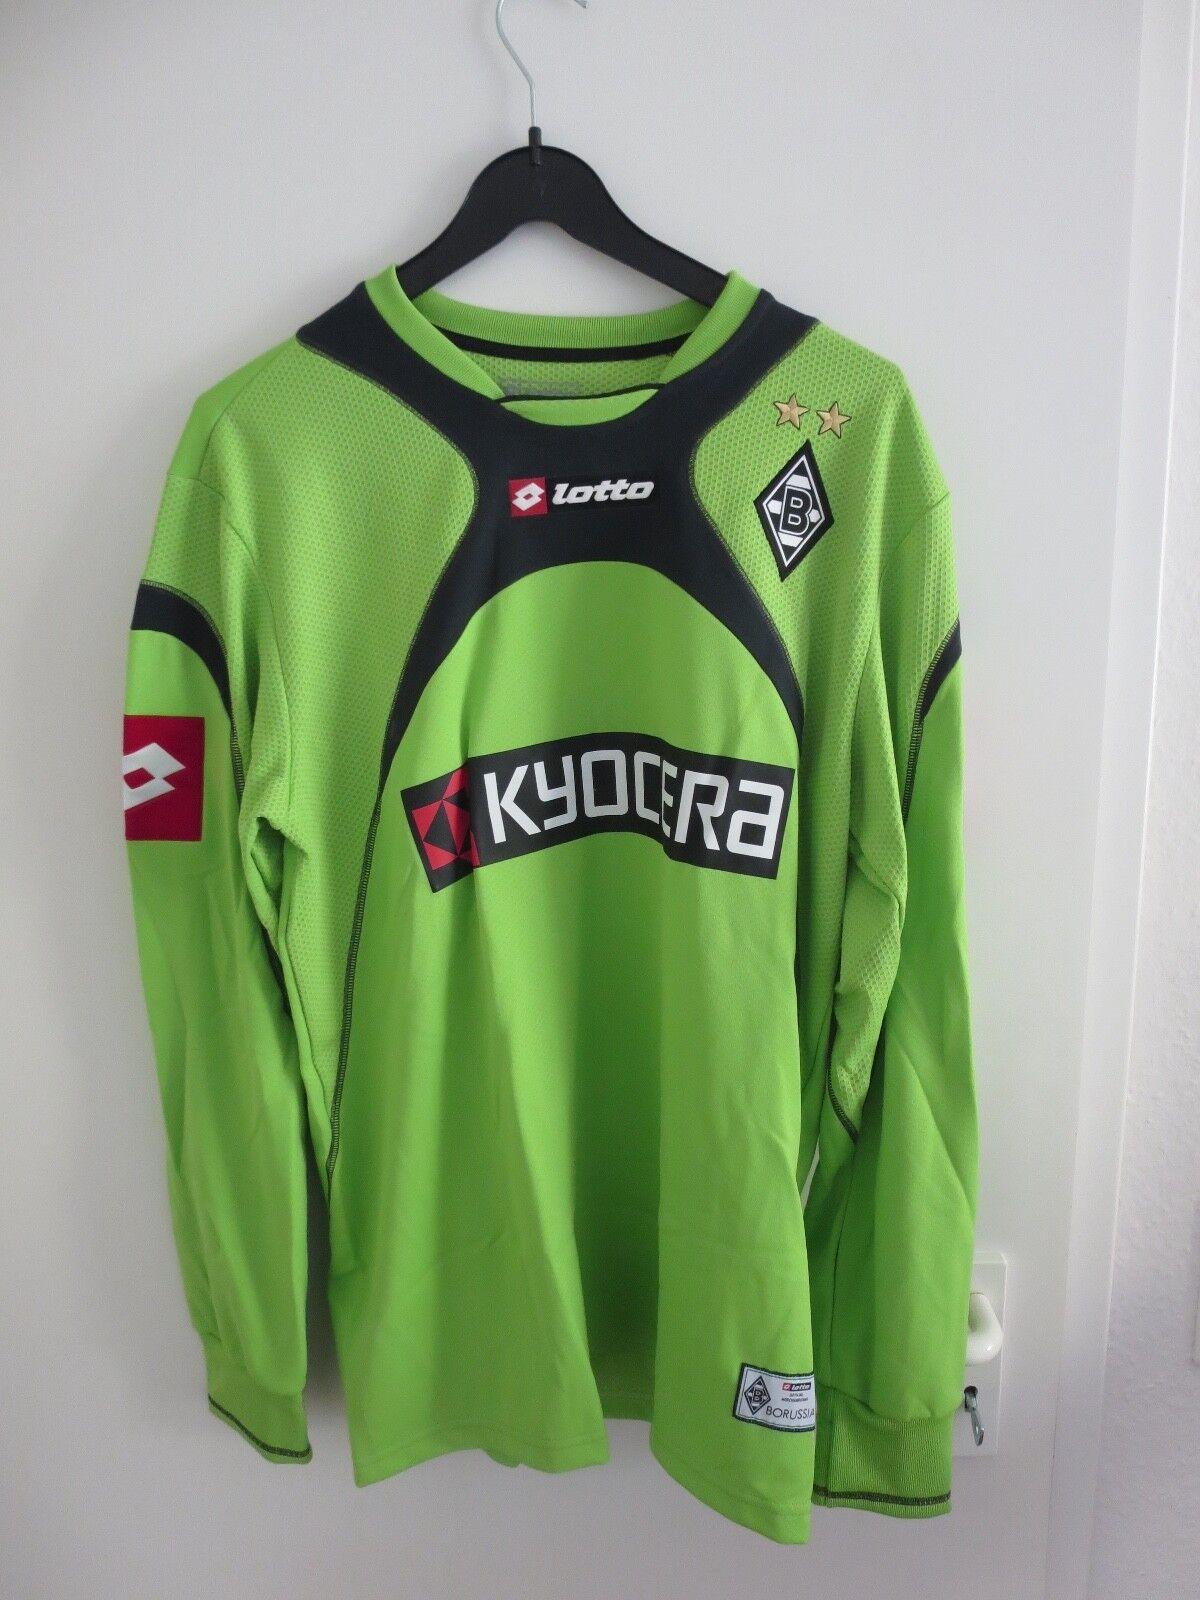 Trikot – Borussia Mönchengladbach – Logan Bailly – XL - Zustand sehr gut - Lotto